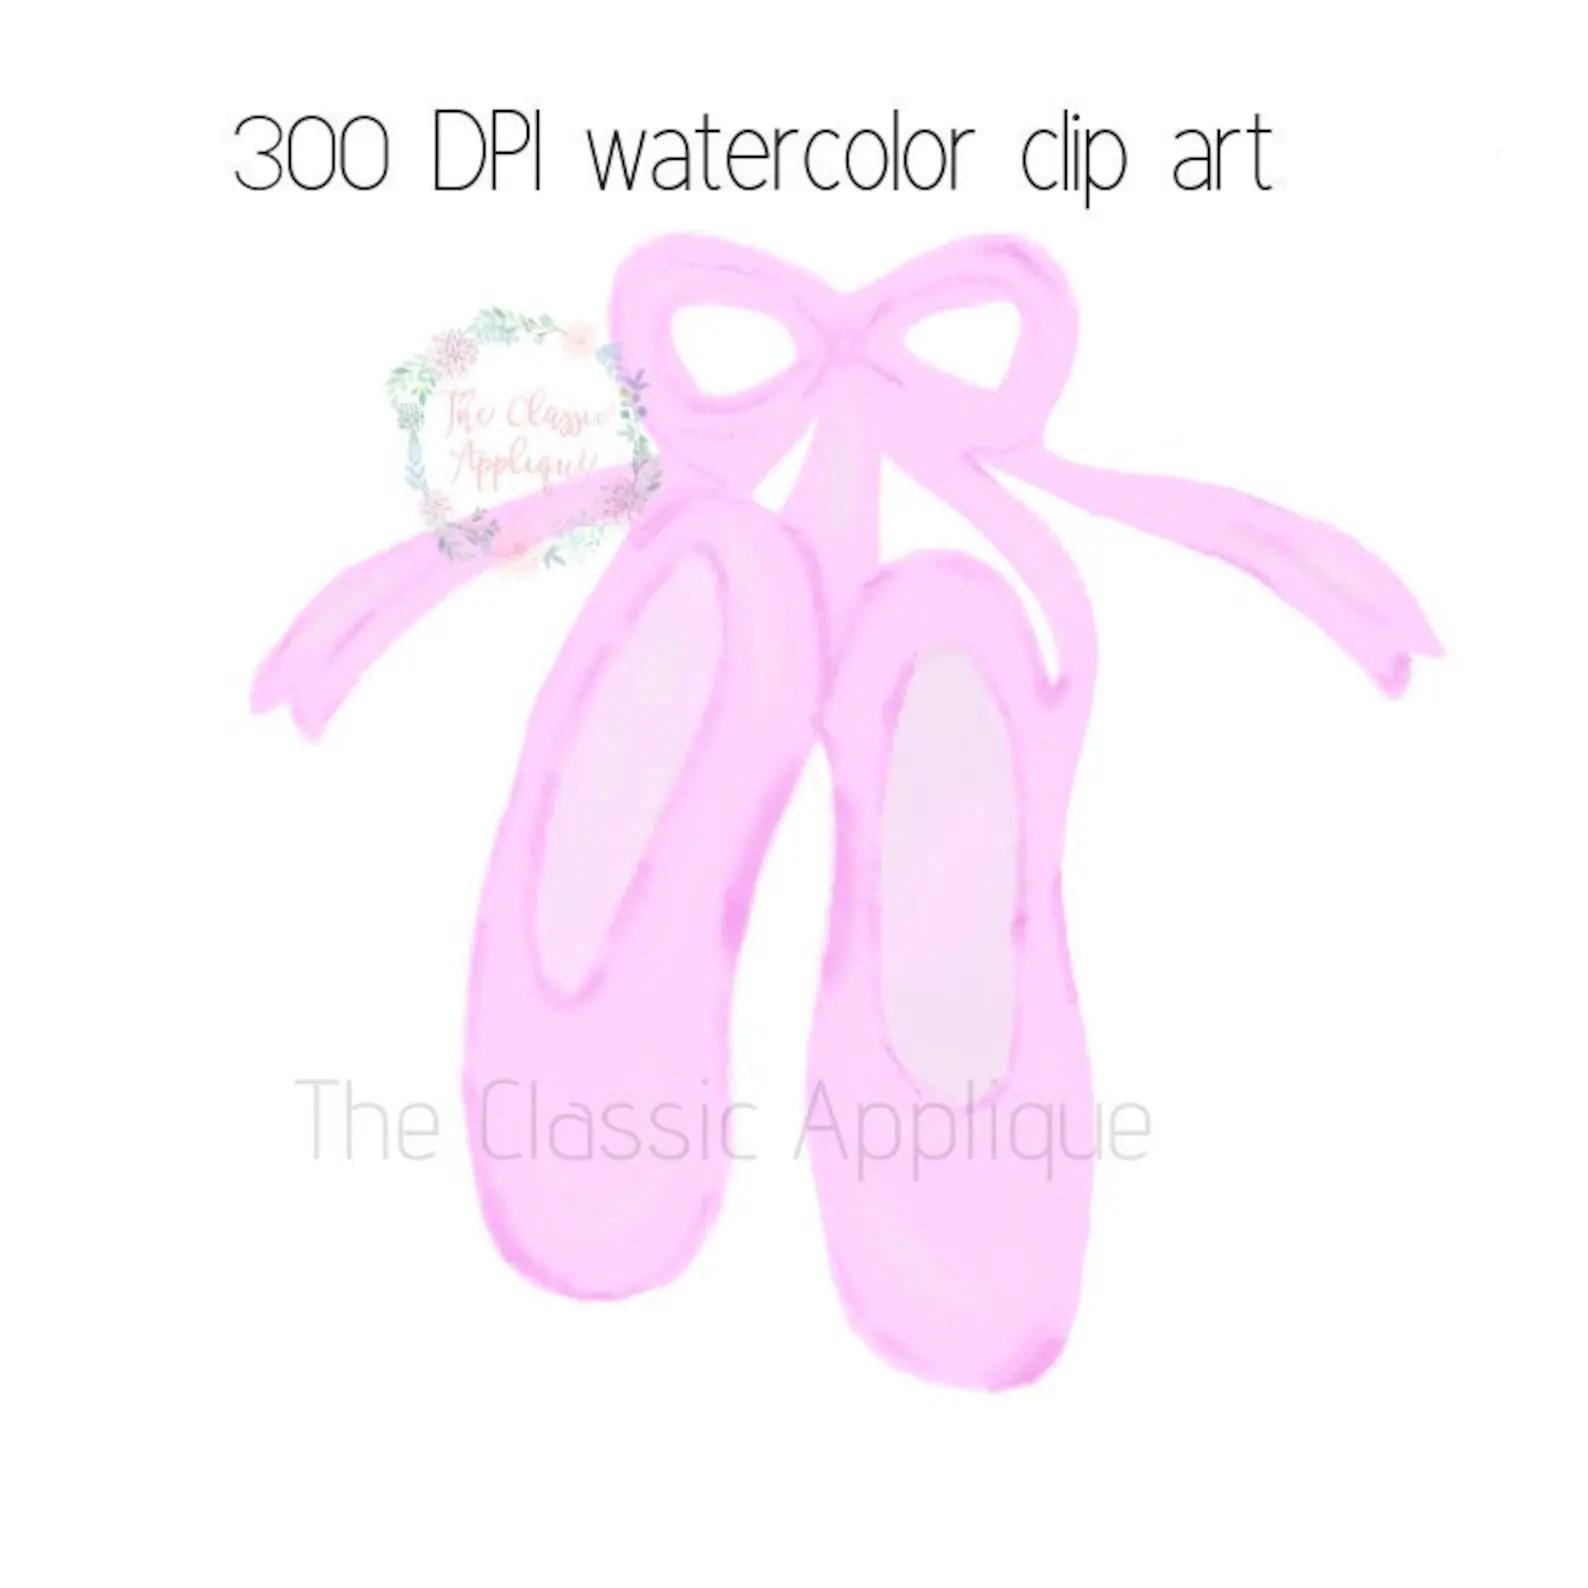 Ballerina Ballet Shoes Slippers Watercolor Printable